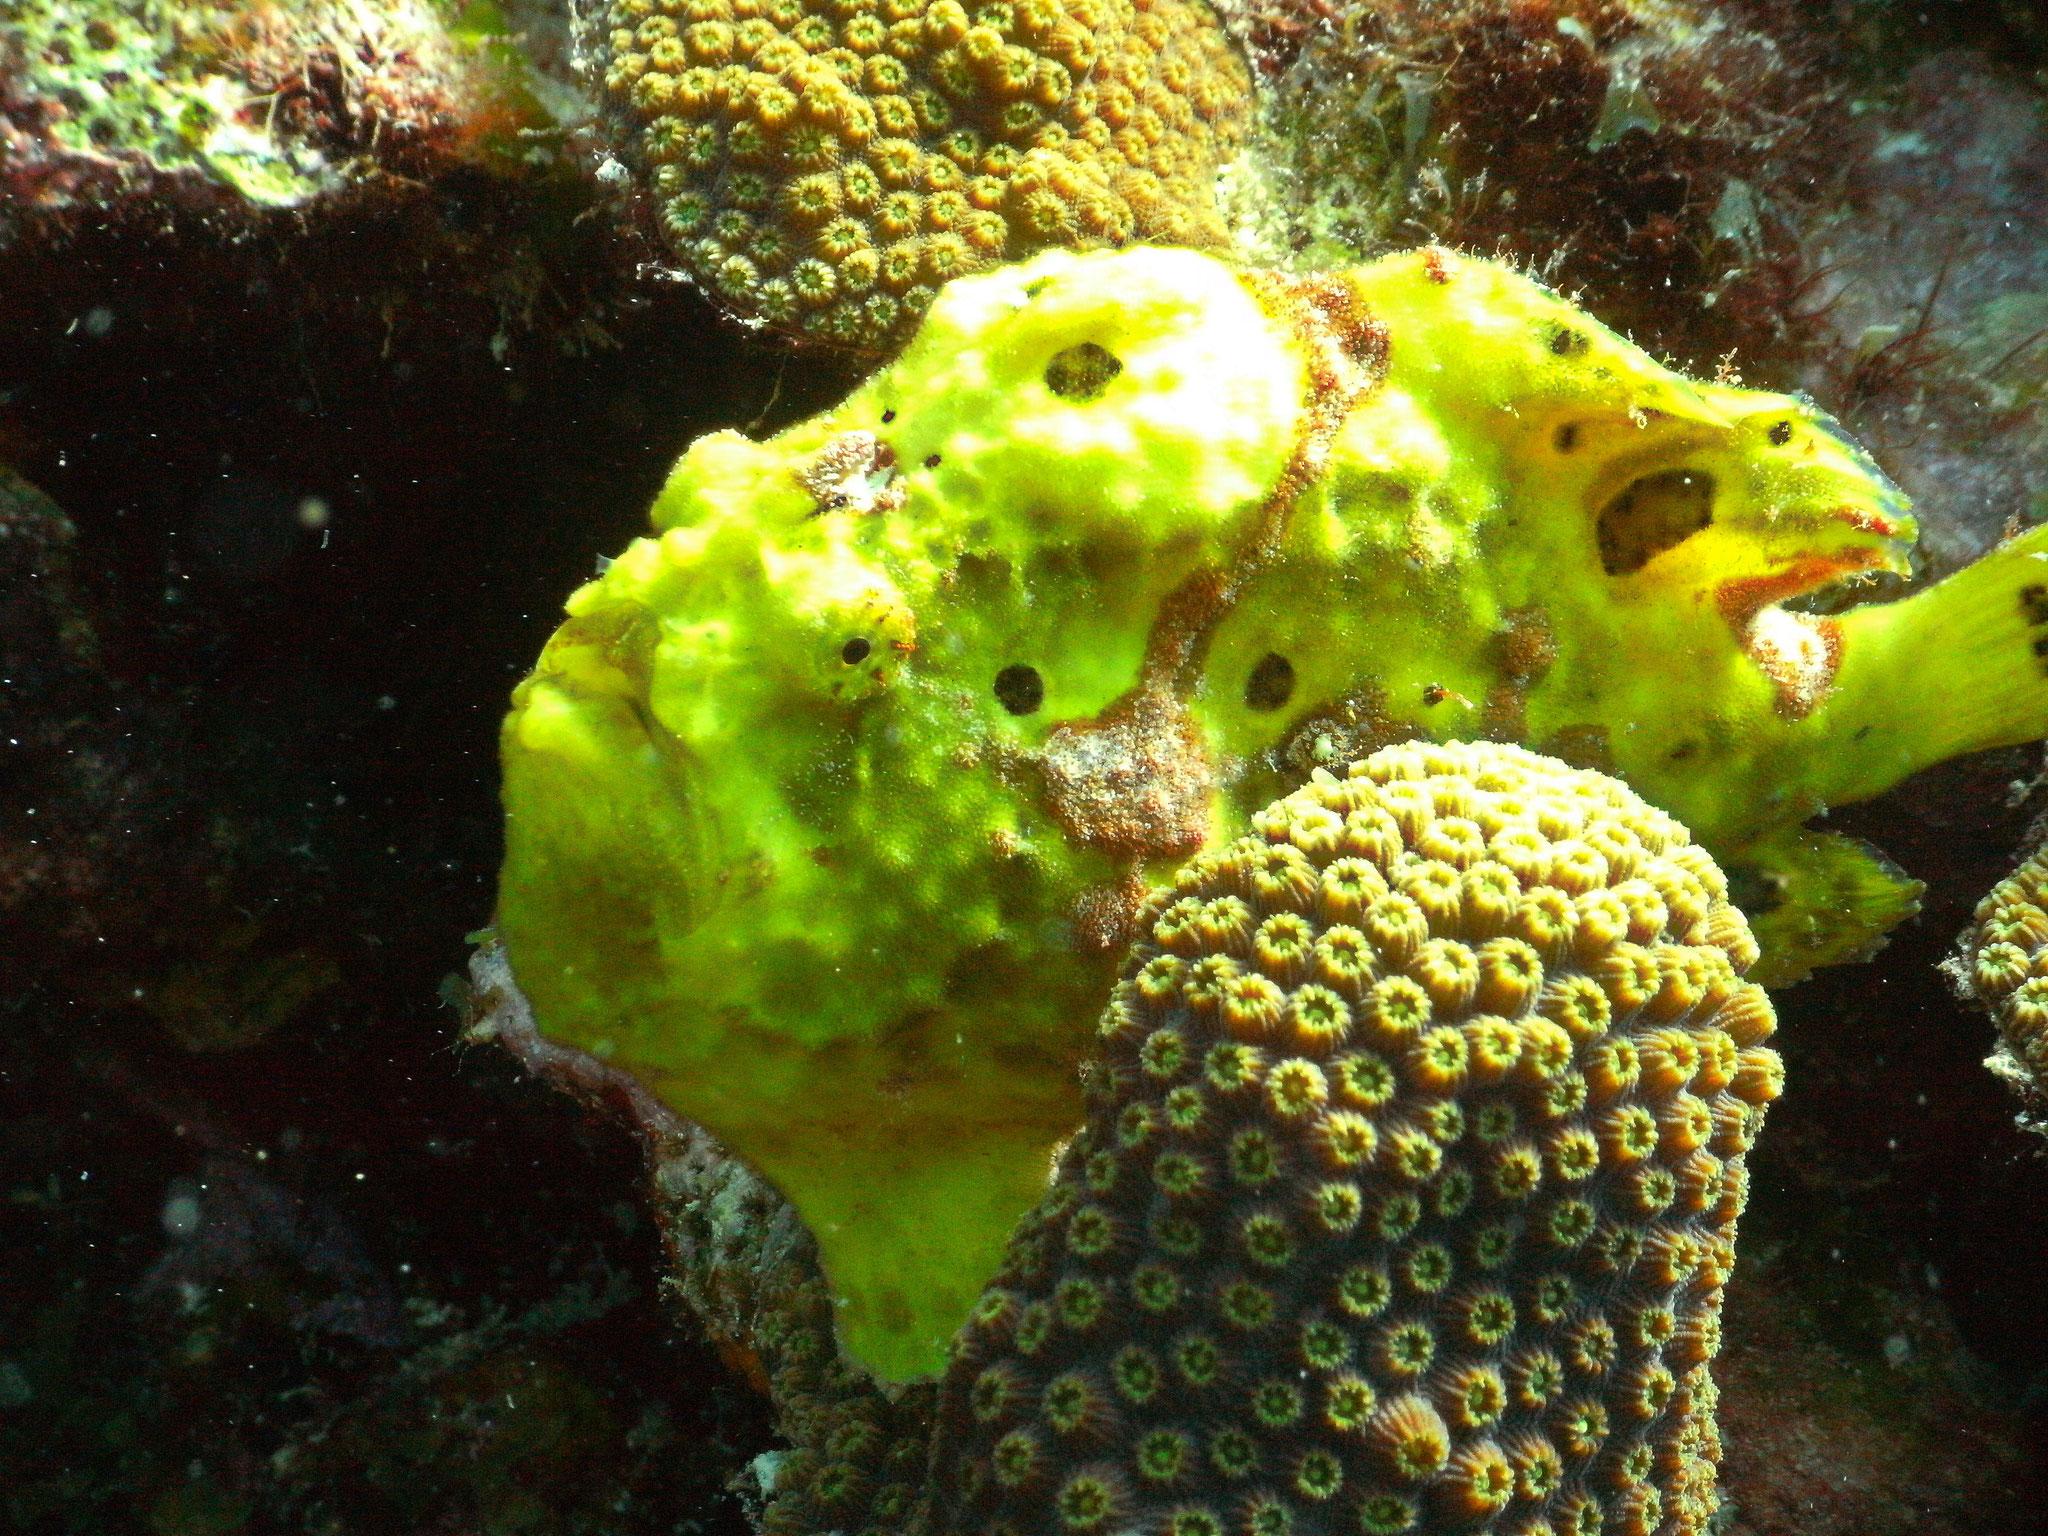 Frogfisch-urlaub-curacao-ferienhaus-pool-karibik